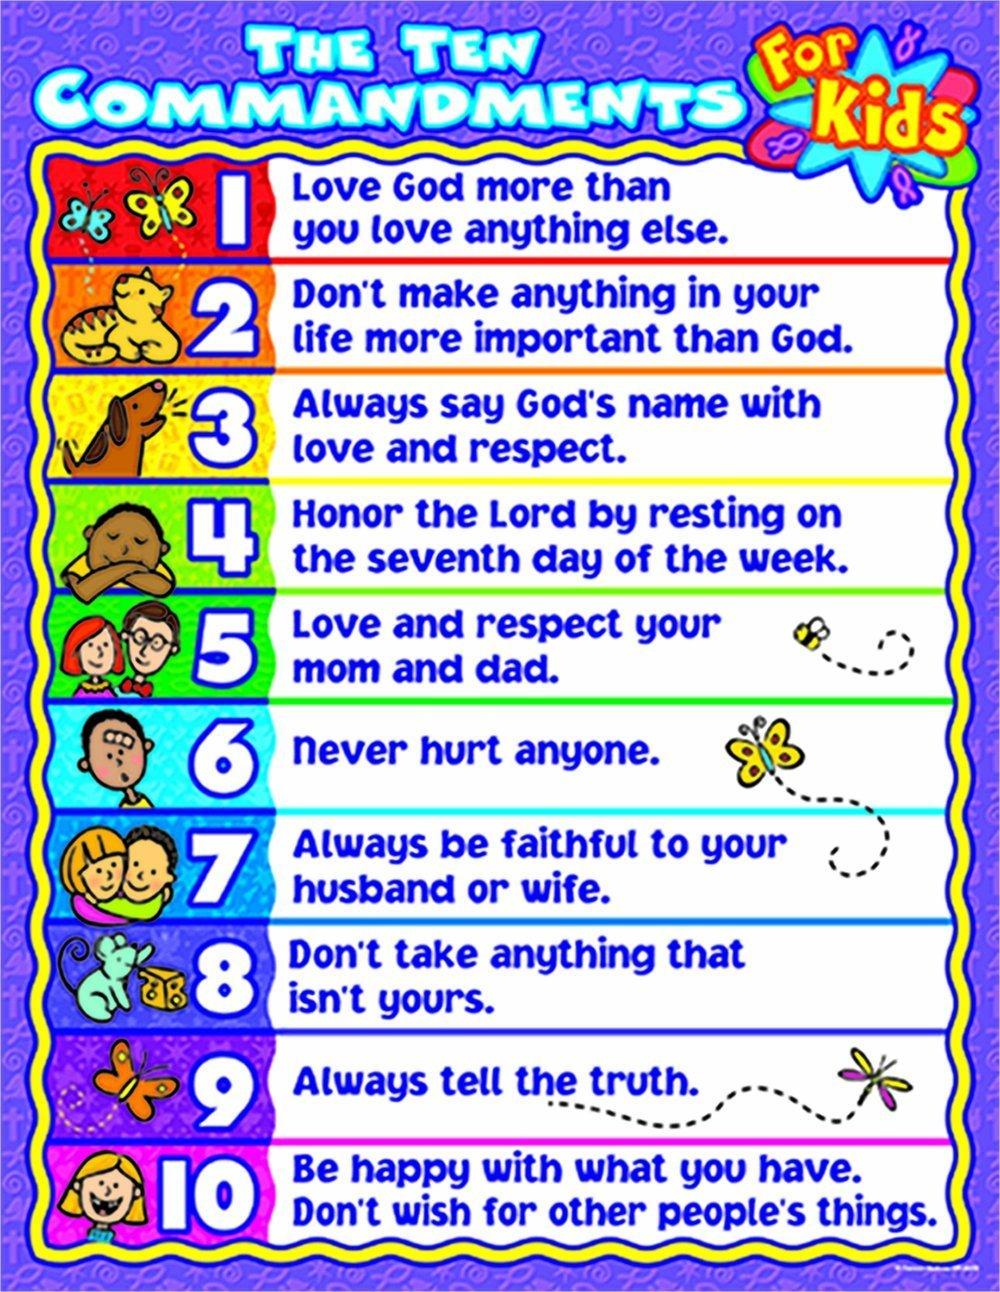 CD 6359 TEN COMMANDMENTS FOR KIDS CHART